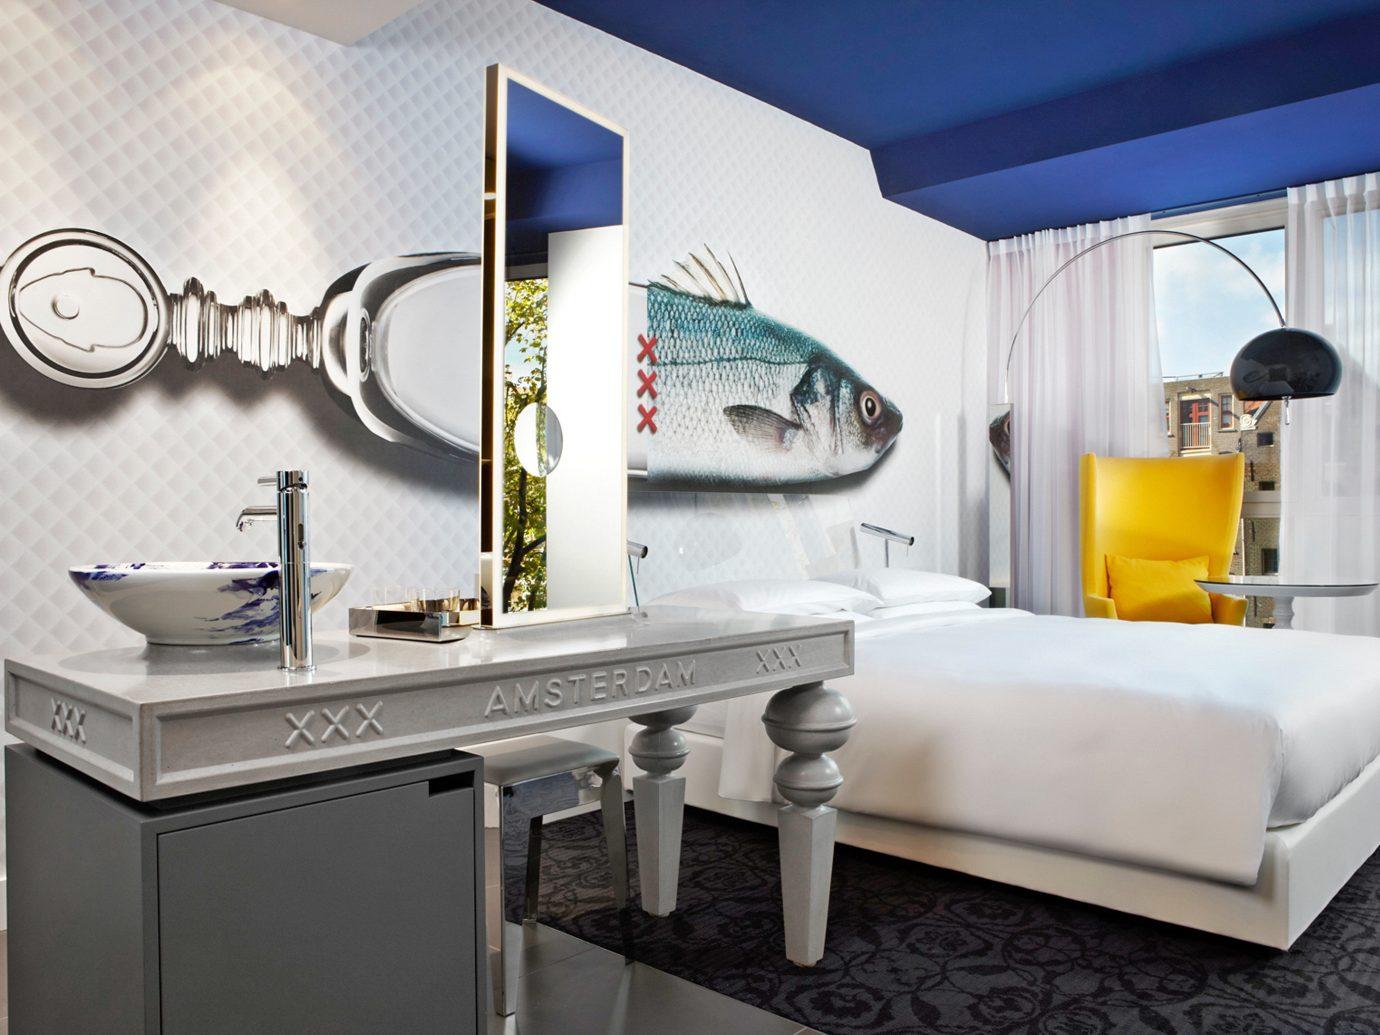 Amsterdam Boutique Hotels Hotels The Netherlands indoor floor wall room property interior design furniture living room home Design